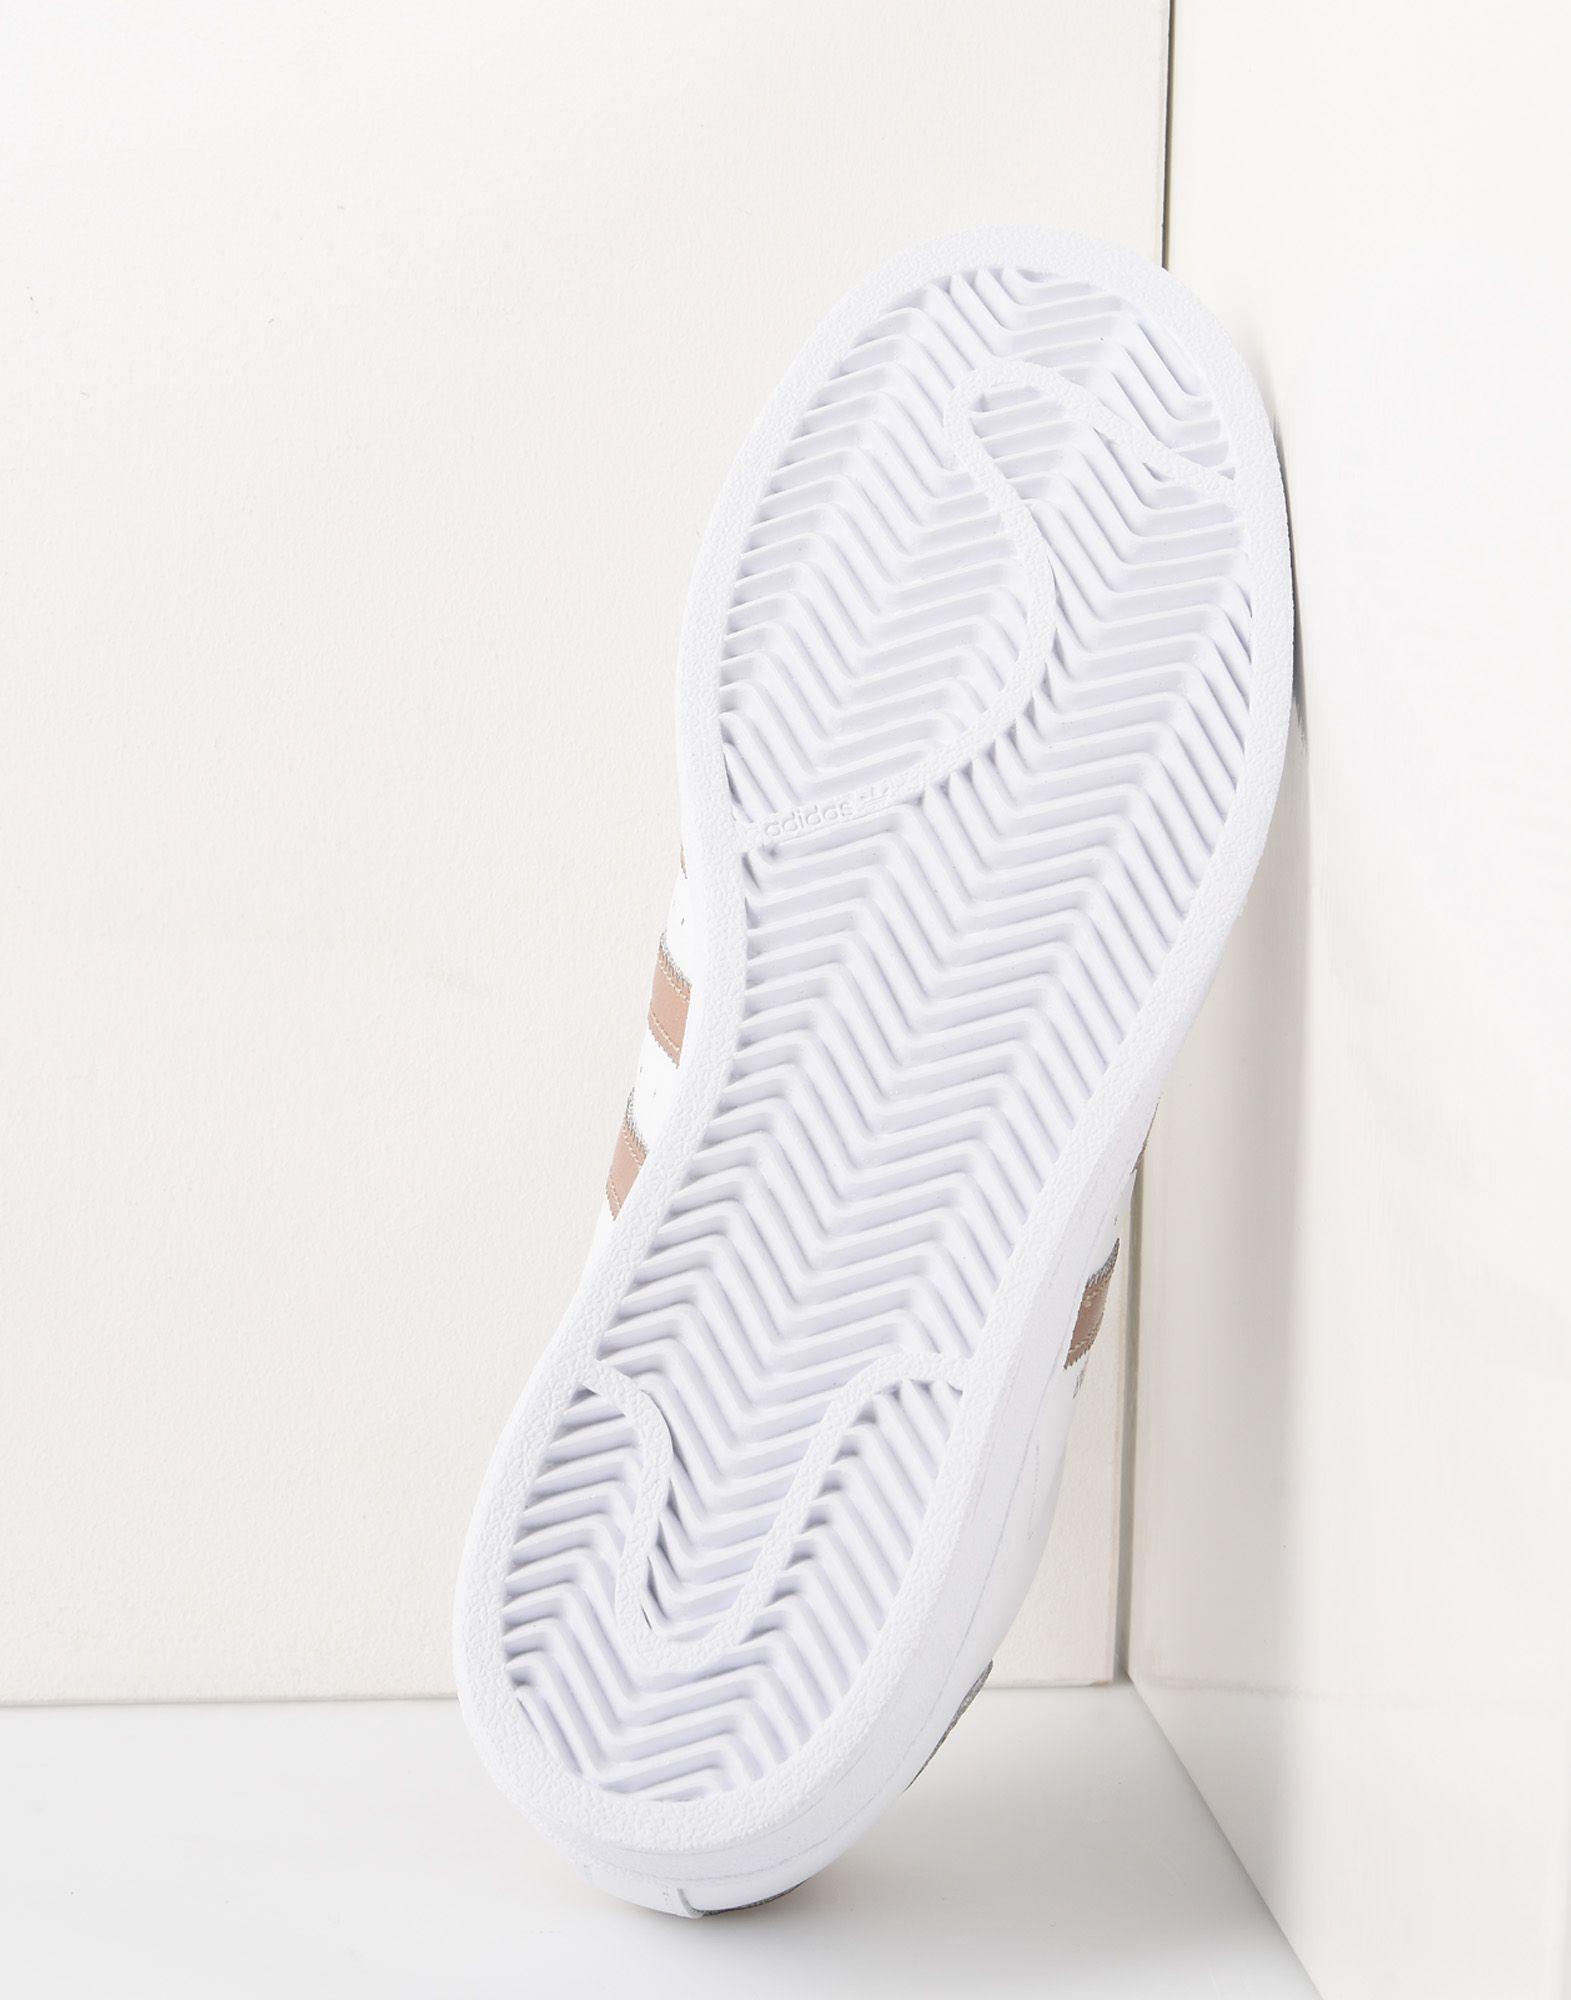 Sneakers Adidas Originals Superstar W - Femme - Sneakers Adidas Originals sur